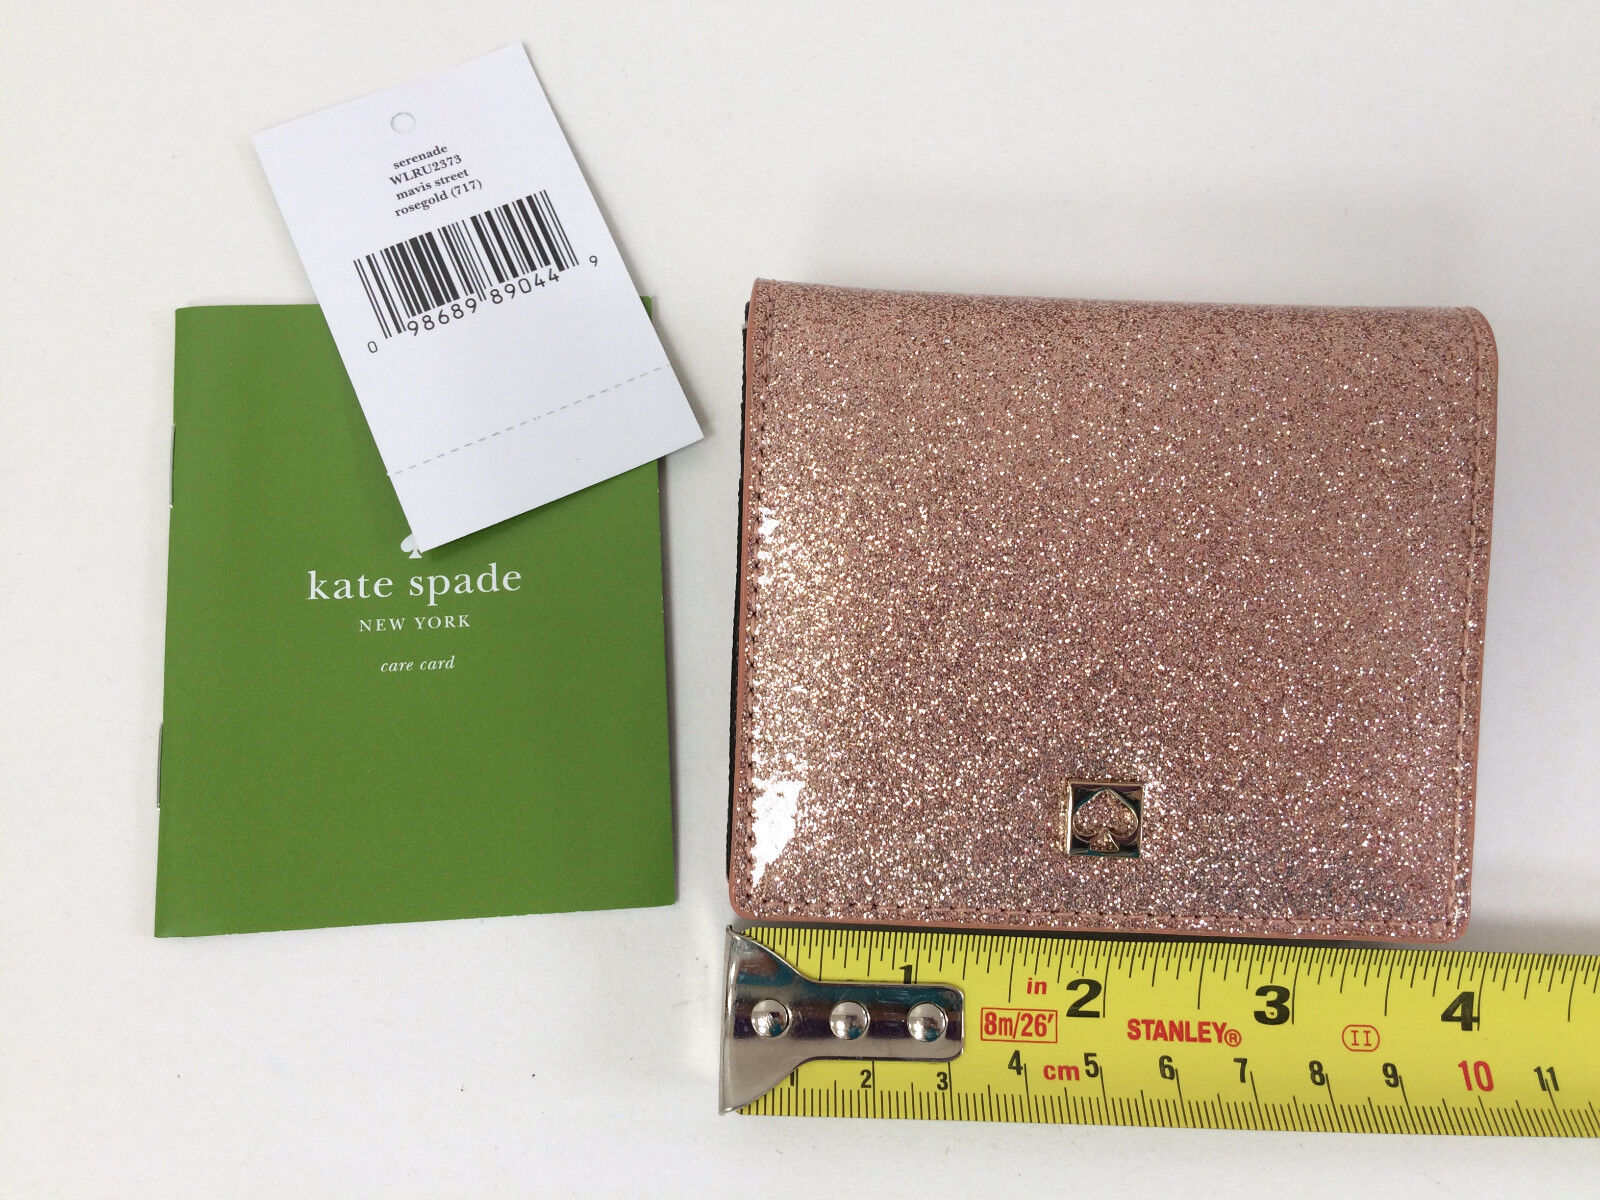 NWT Kate Spade Mavis Street Neda MD Davis Serenade Wallet Cosm Case